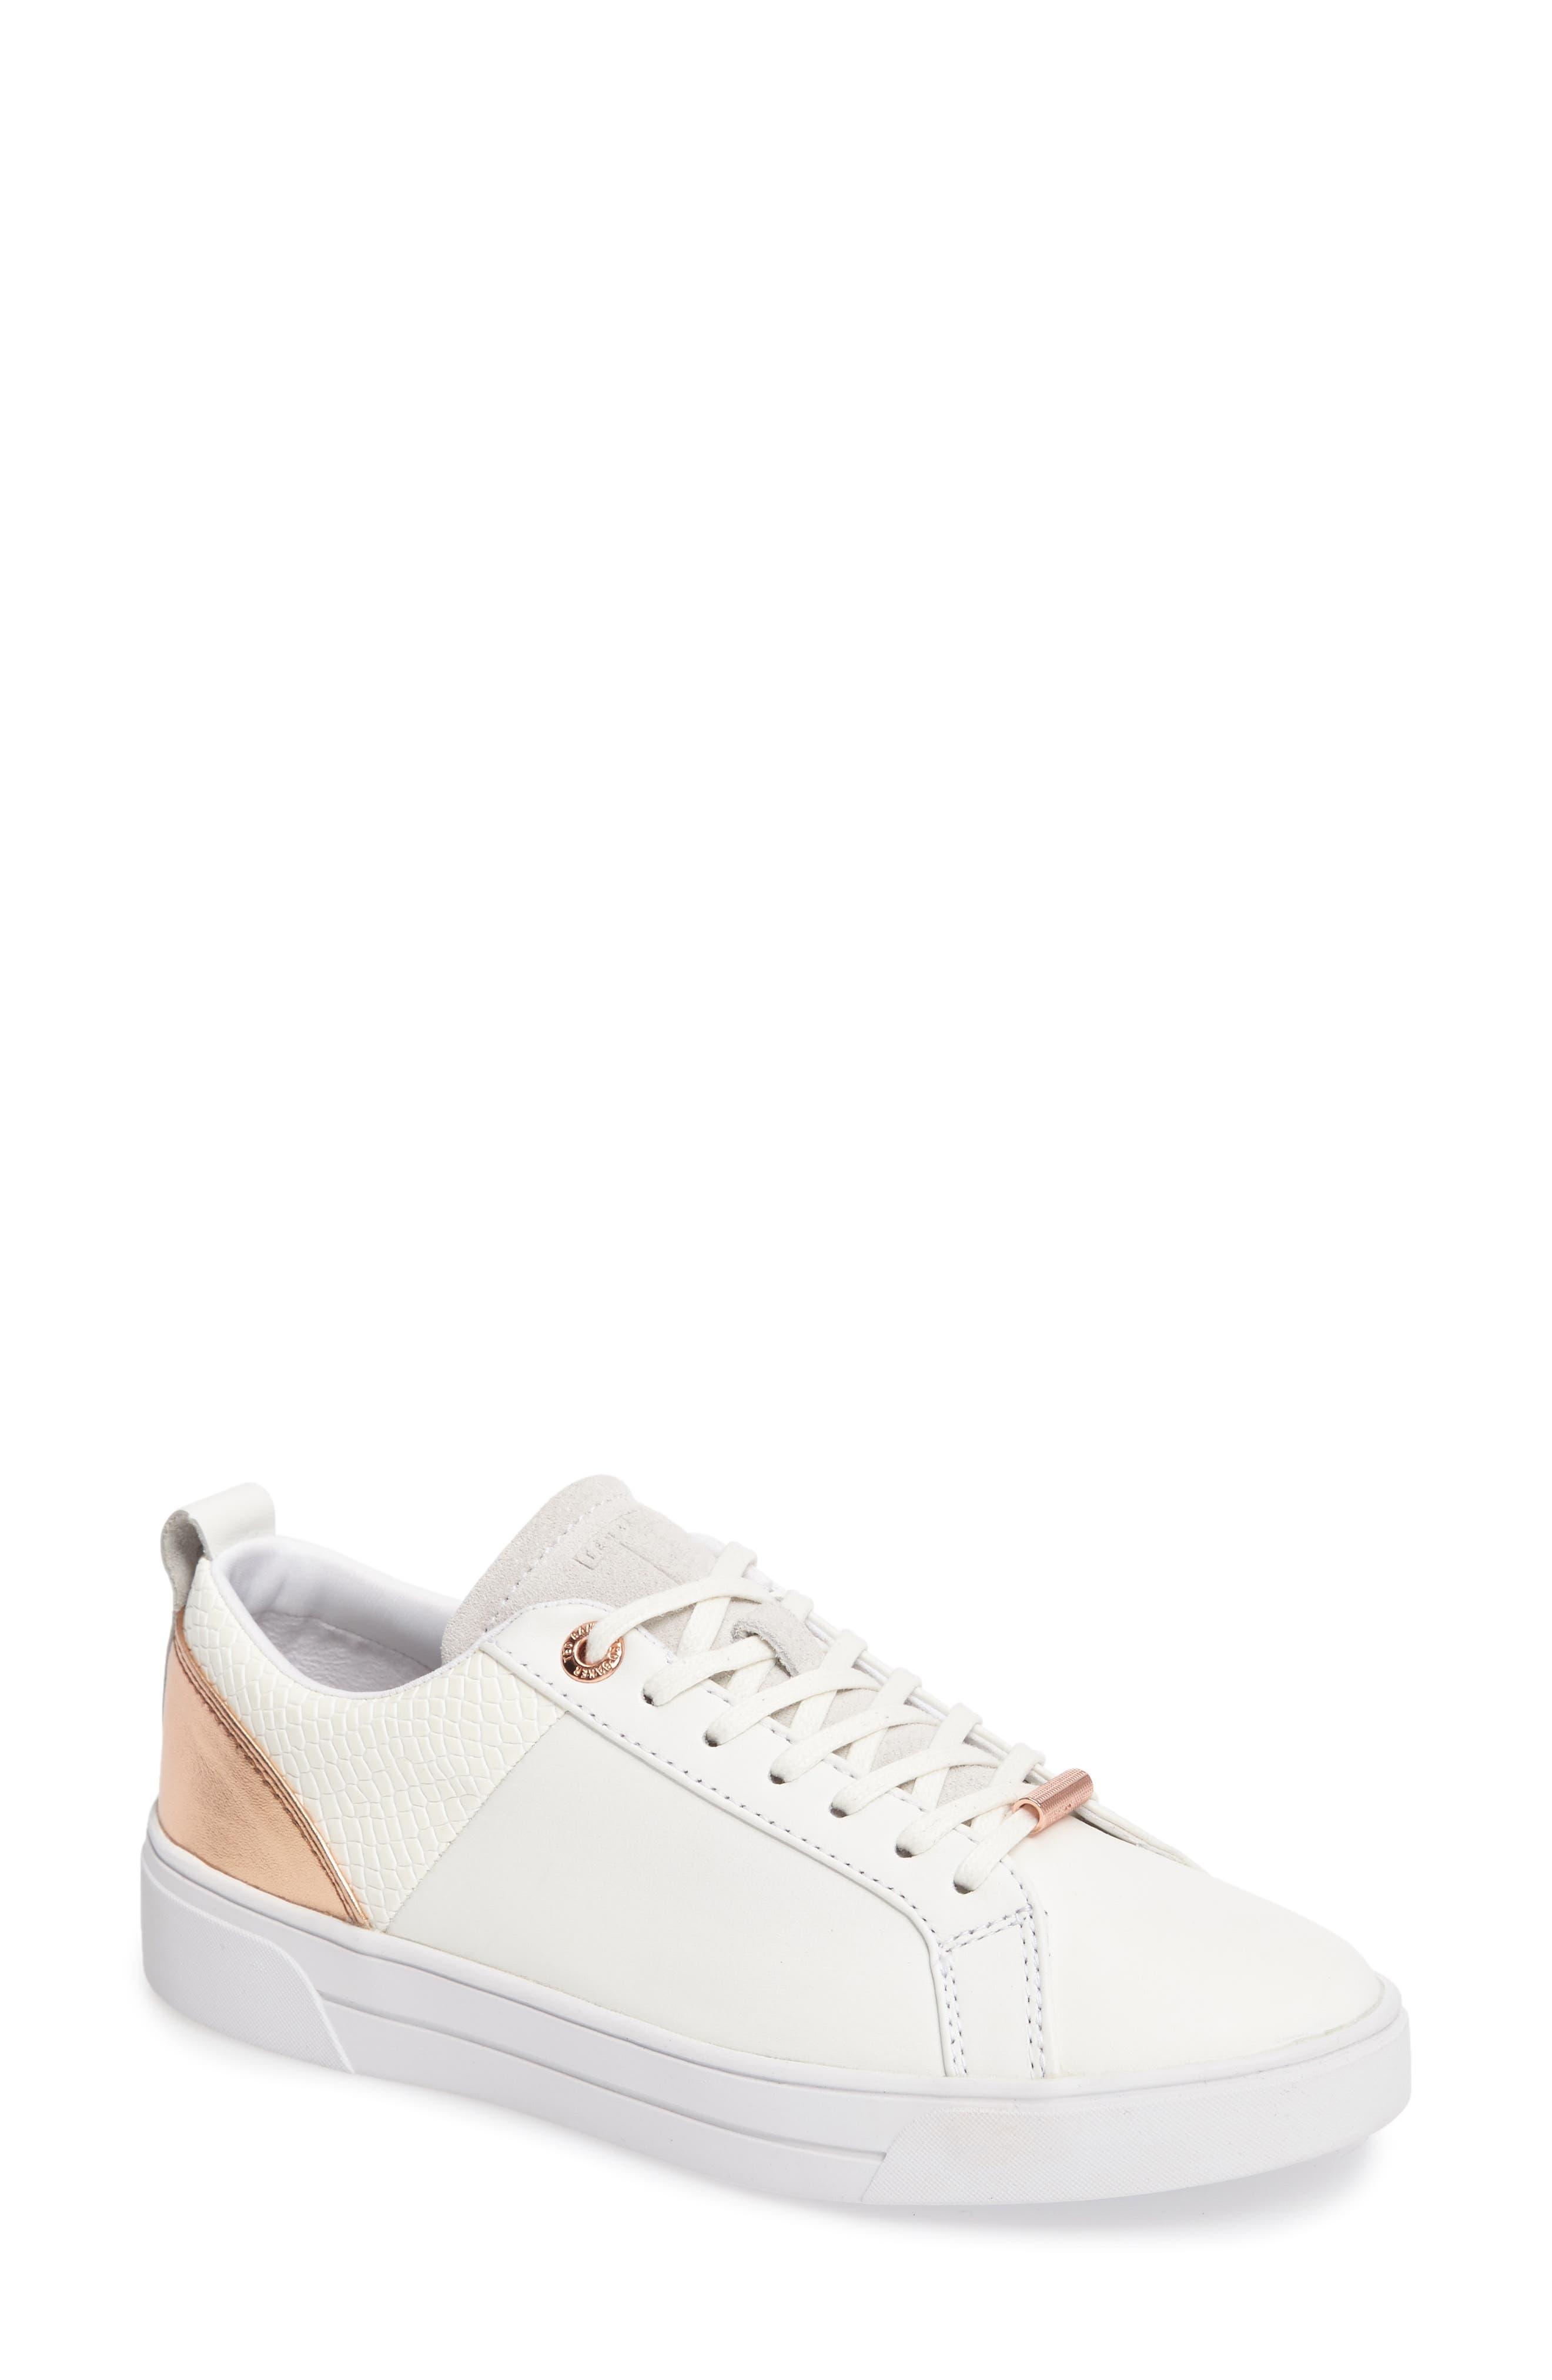 Main Image - Ted Baker London Kulei Lace-Up Sneaker (Women)